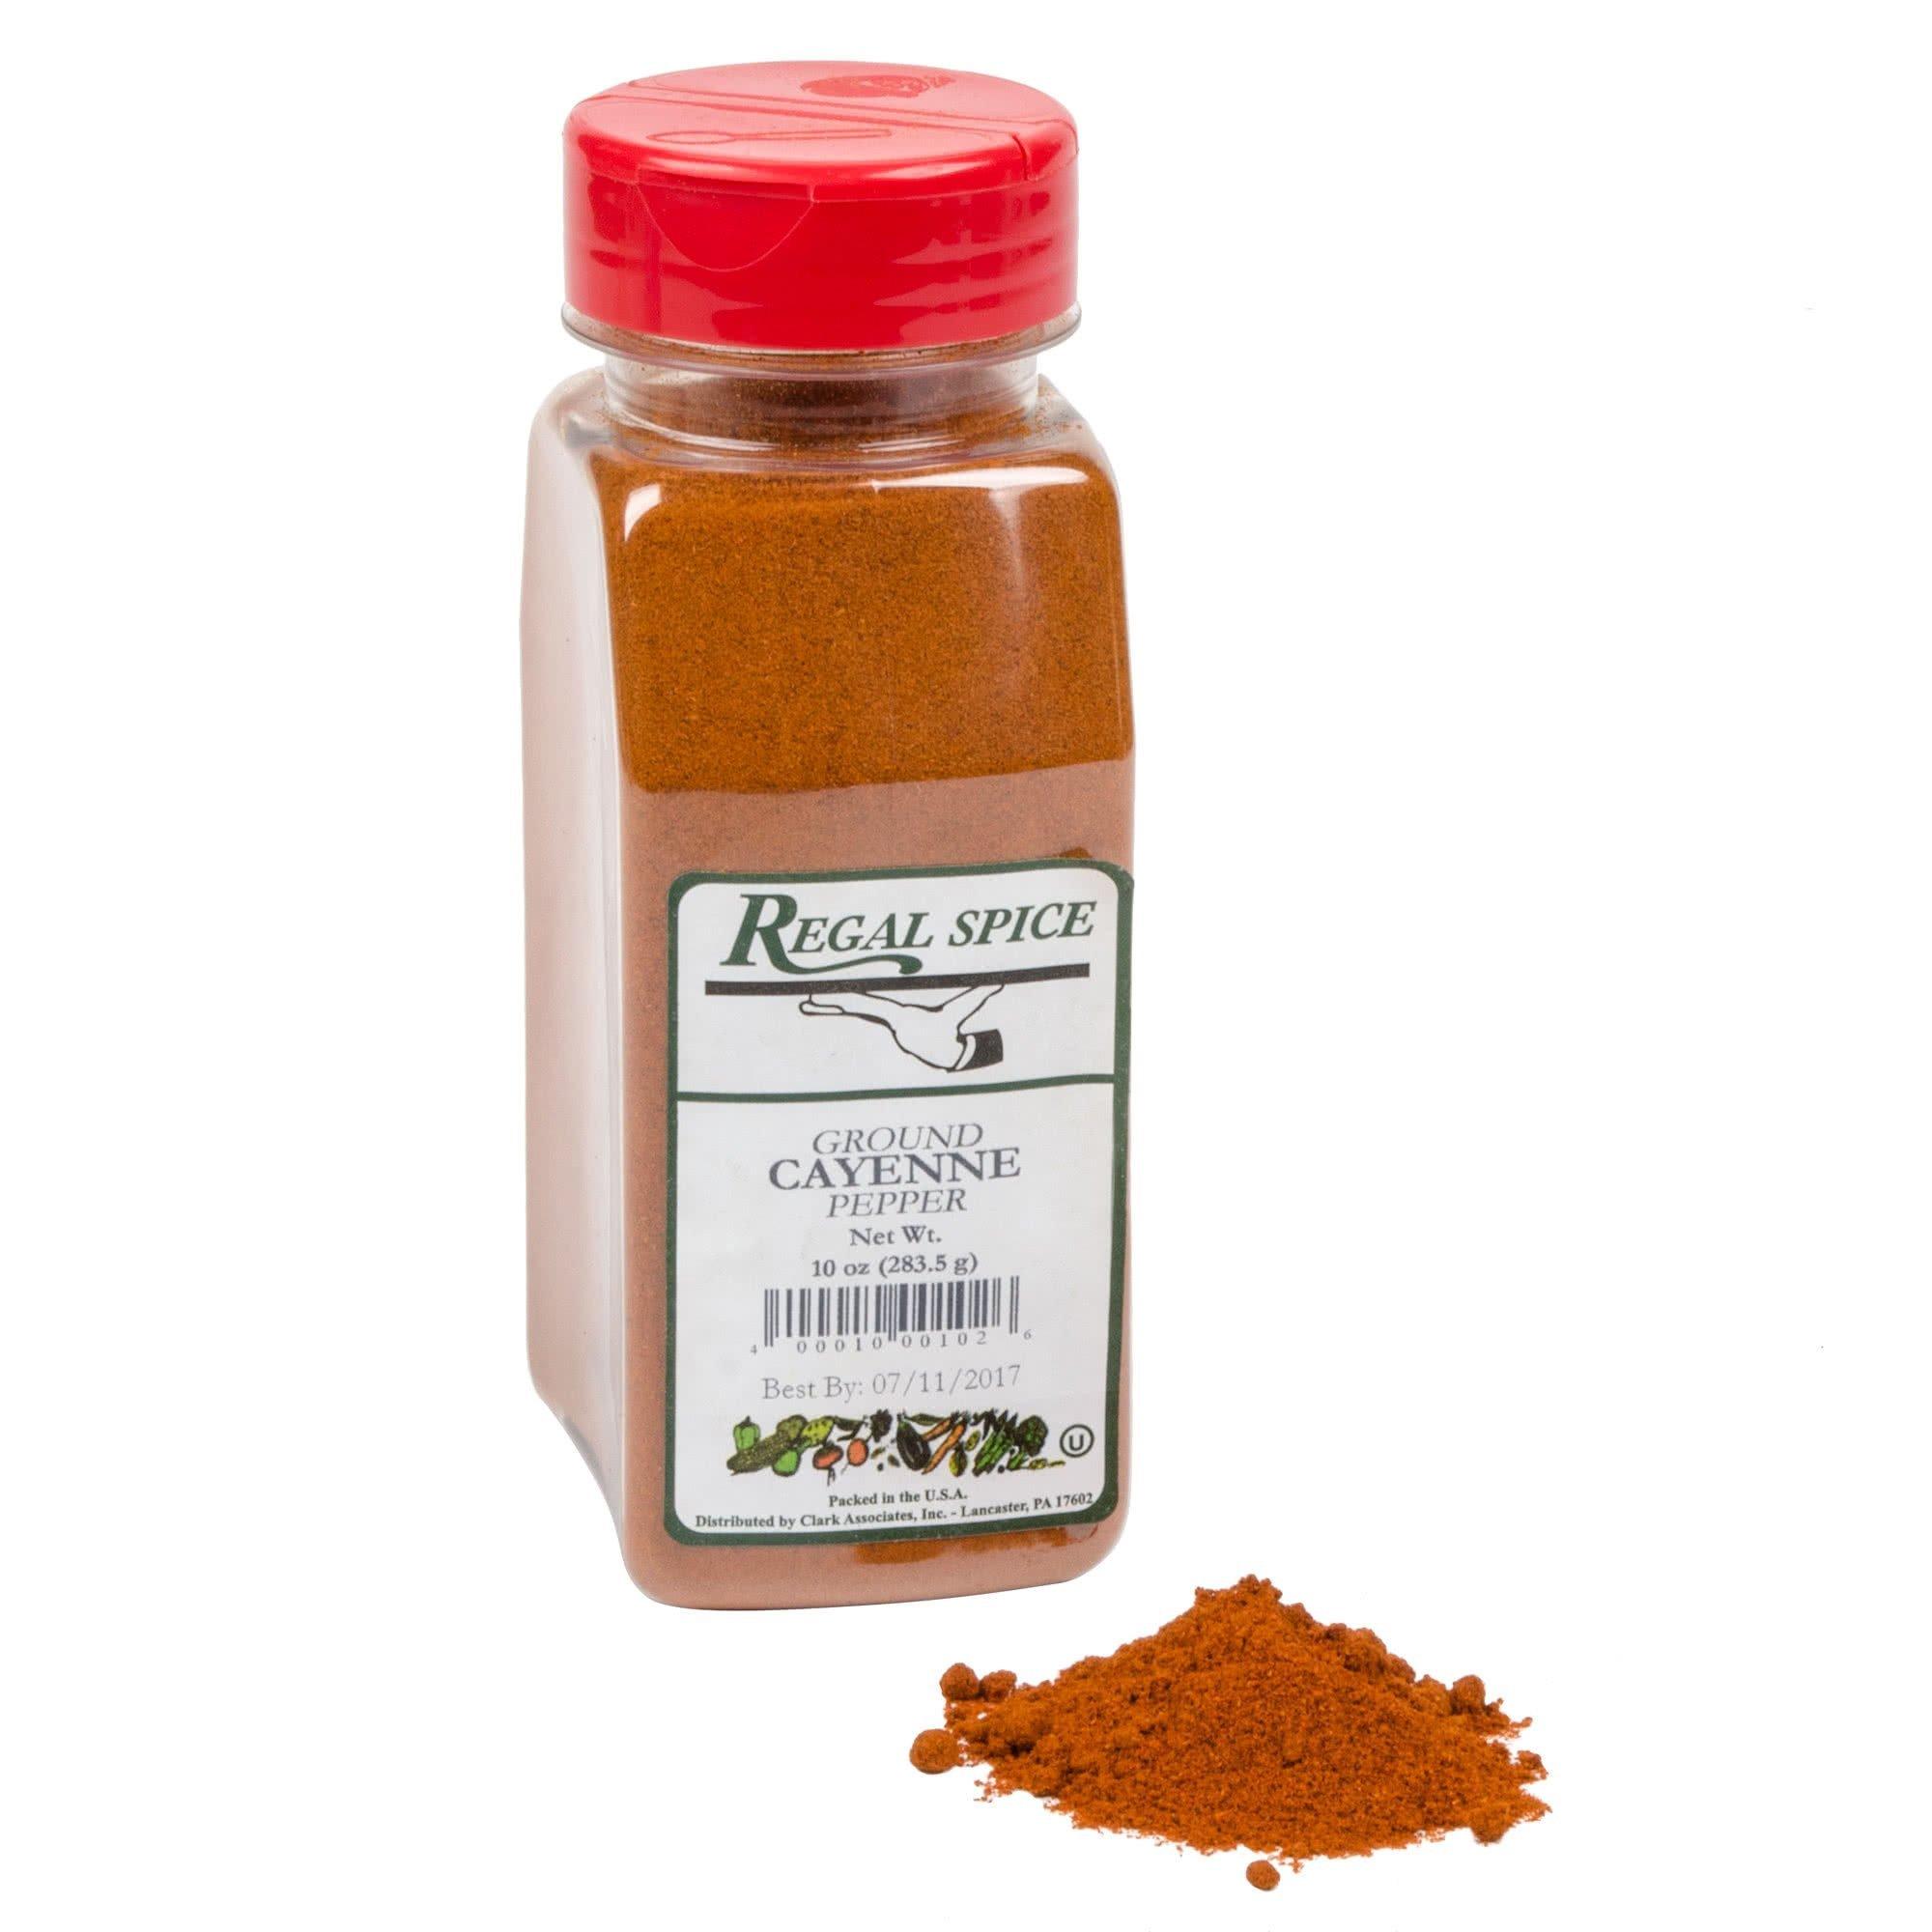 Regal Ground Cayenne Pepper - 10 oz.